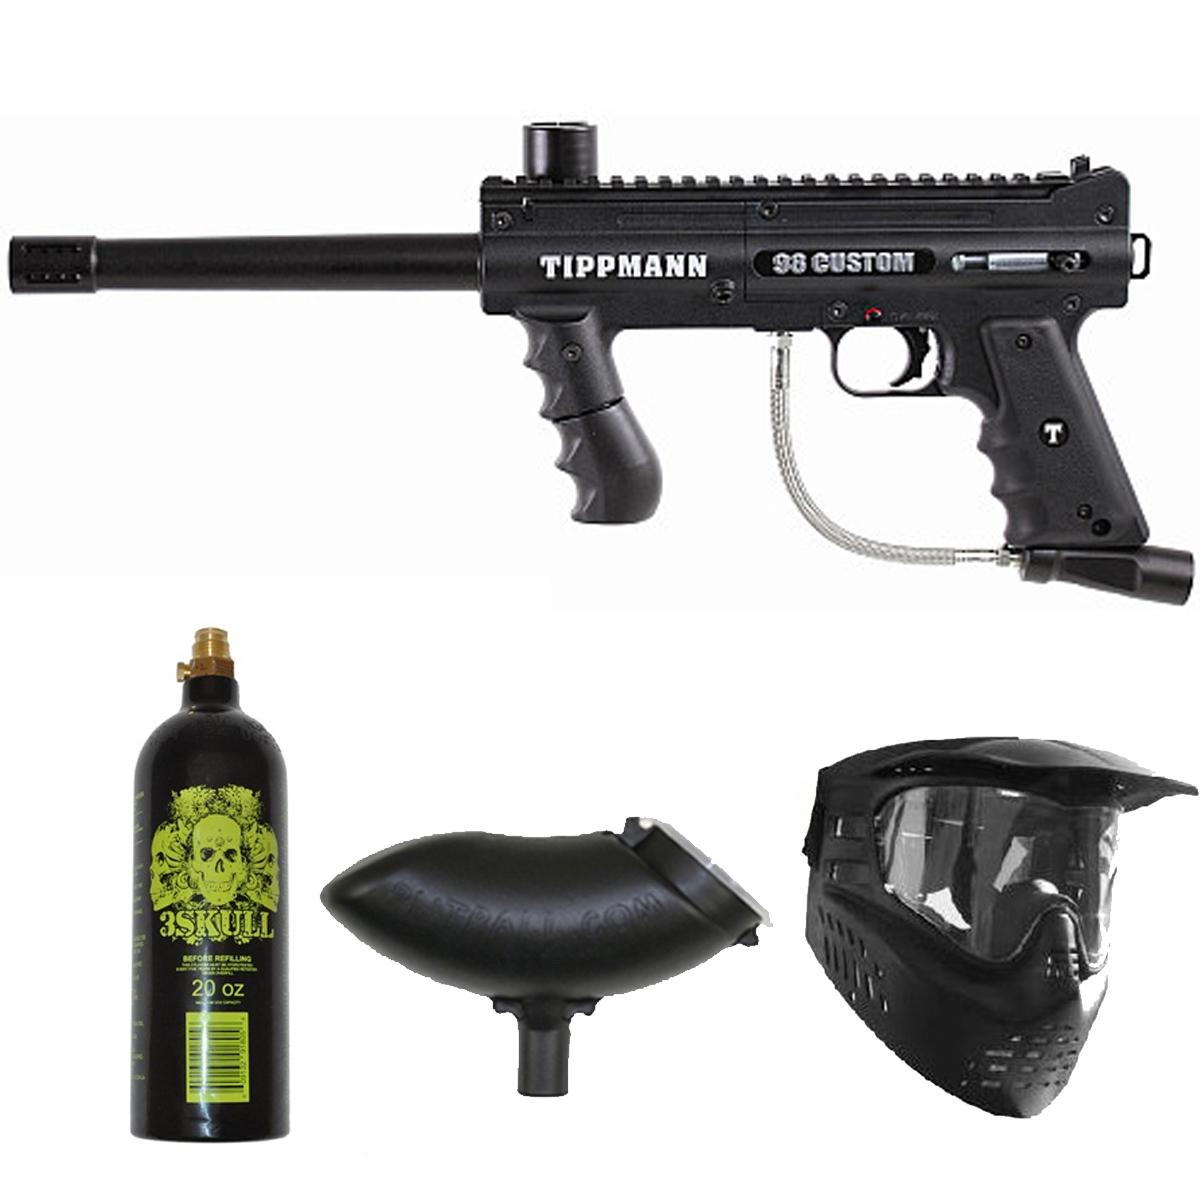 Paintball Gun Custom Tippmann Drawing Cad Drawings Of 98 Mcarterbrowncom Act Marker Skull Package 450x450